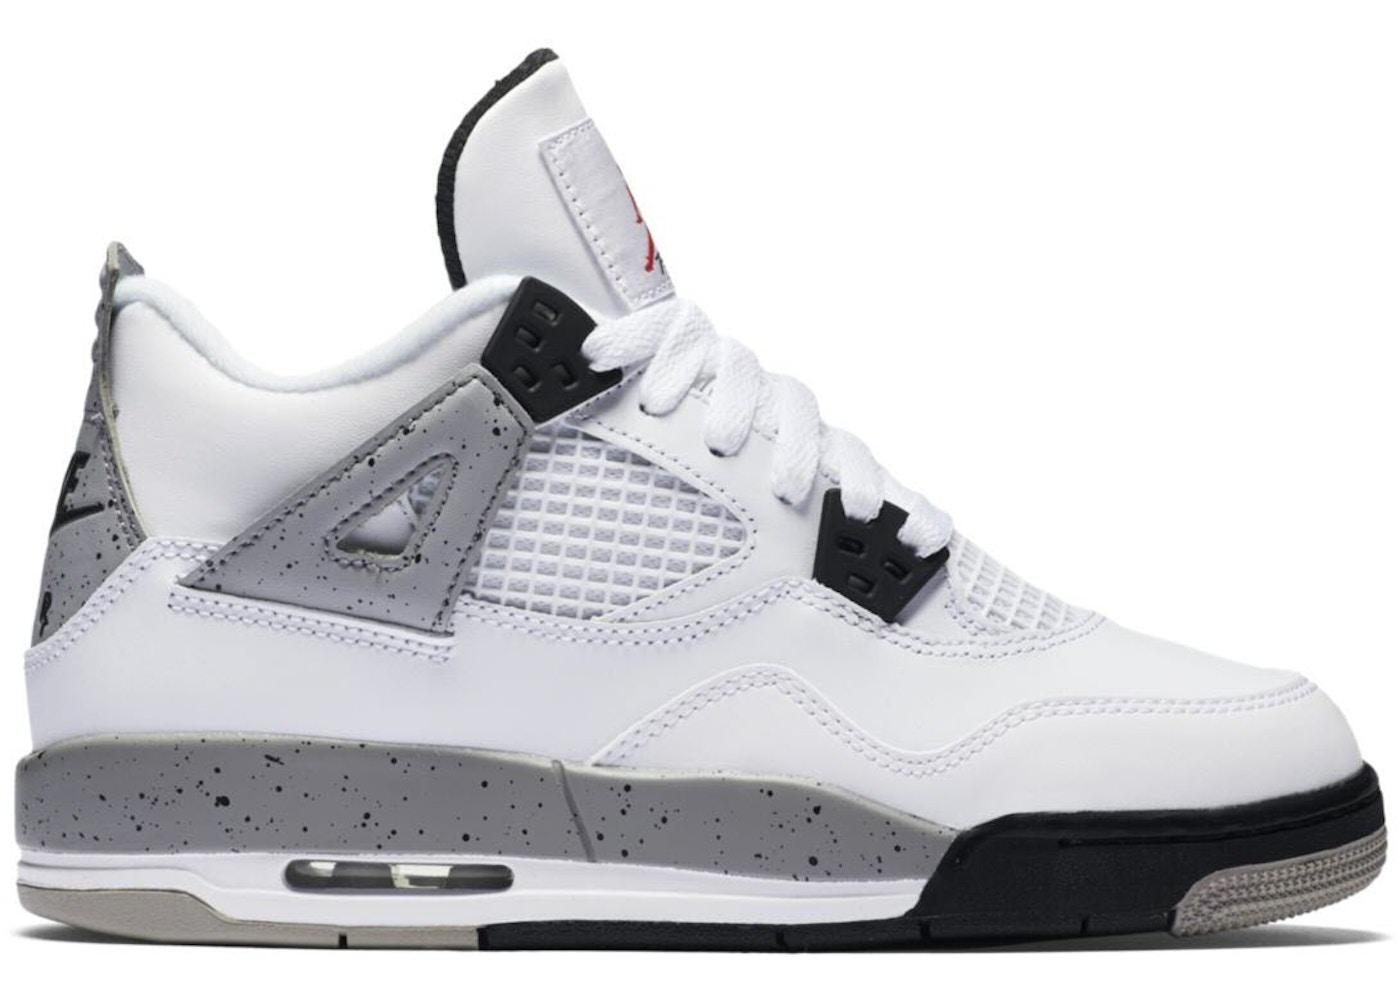 1677a4925523a ... Buy Air Jordan 4 Shoes Deadstock Sneakers ...